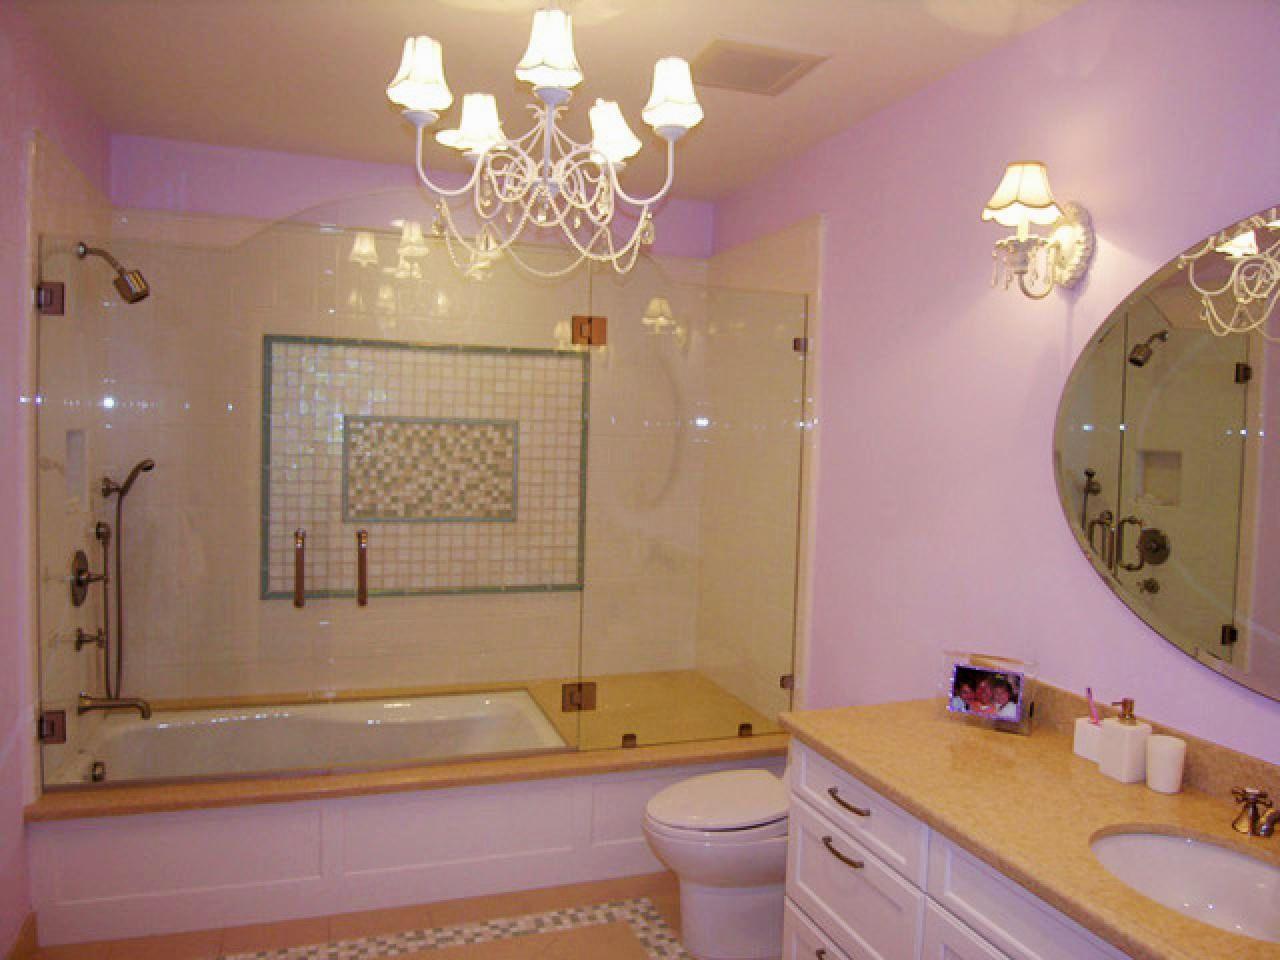 bathroom-decorating-ideas-for-teen-girls-vary-amateur-sex